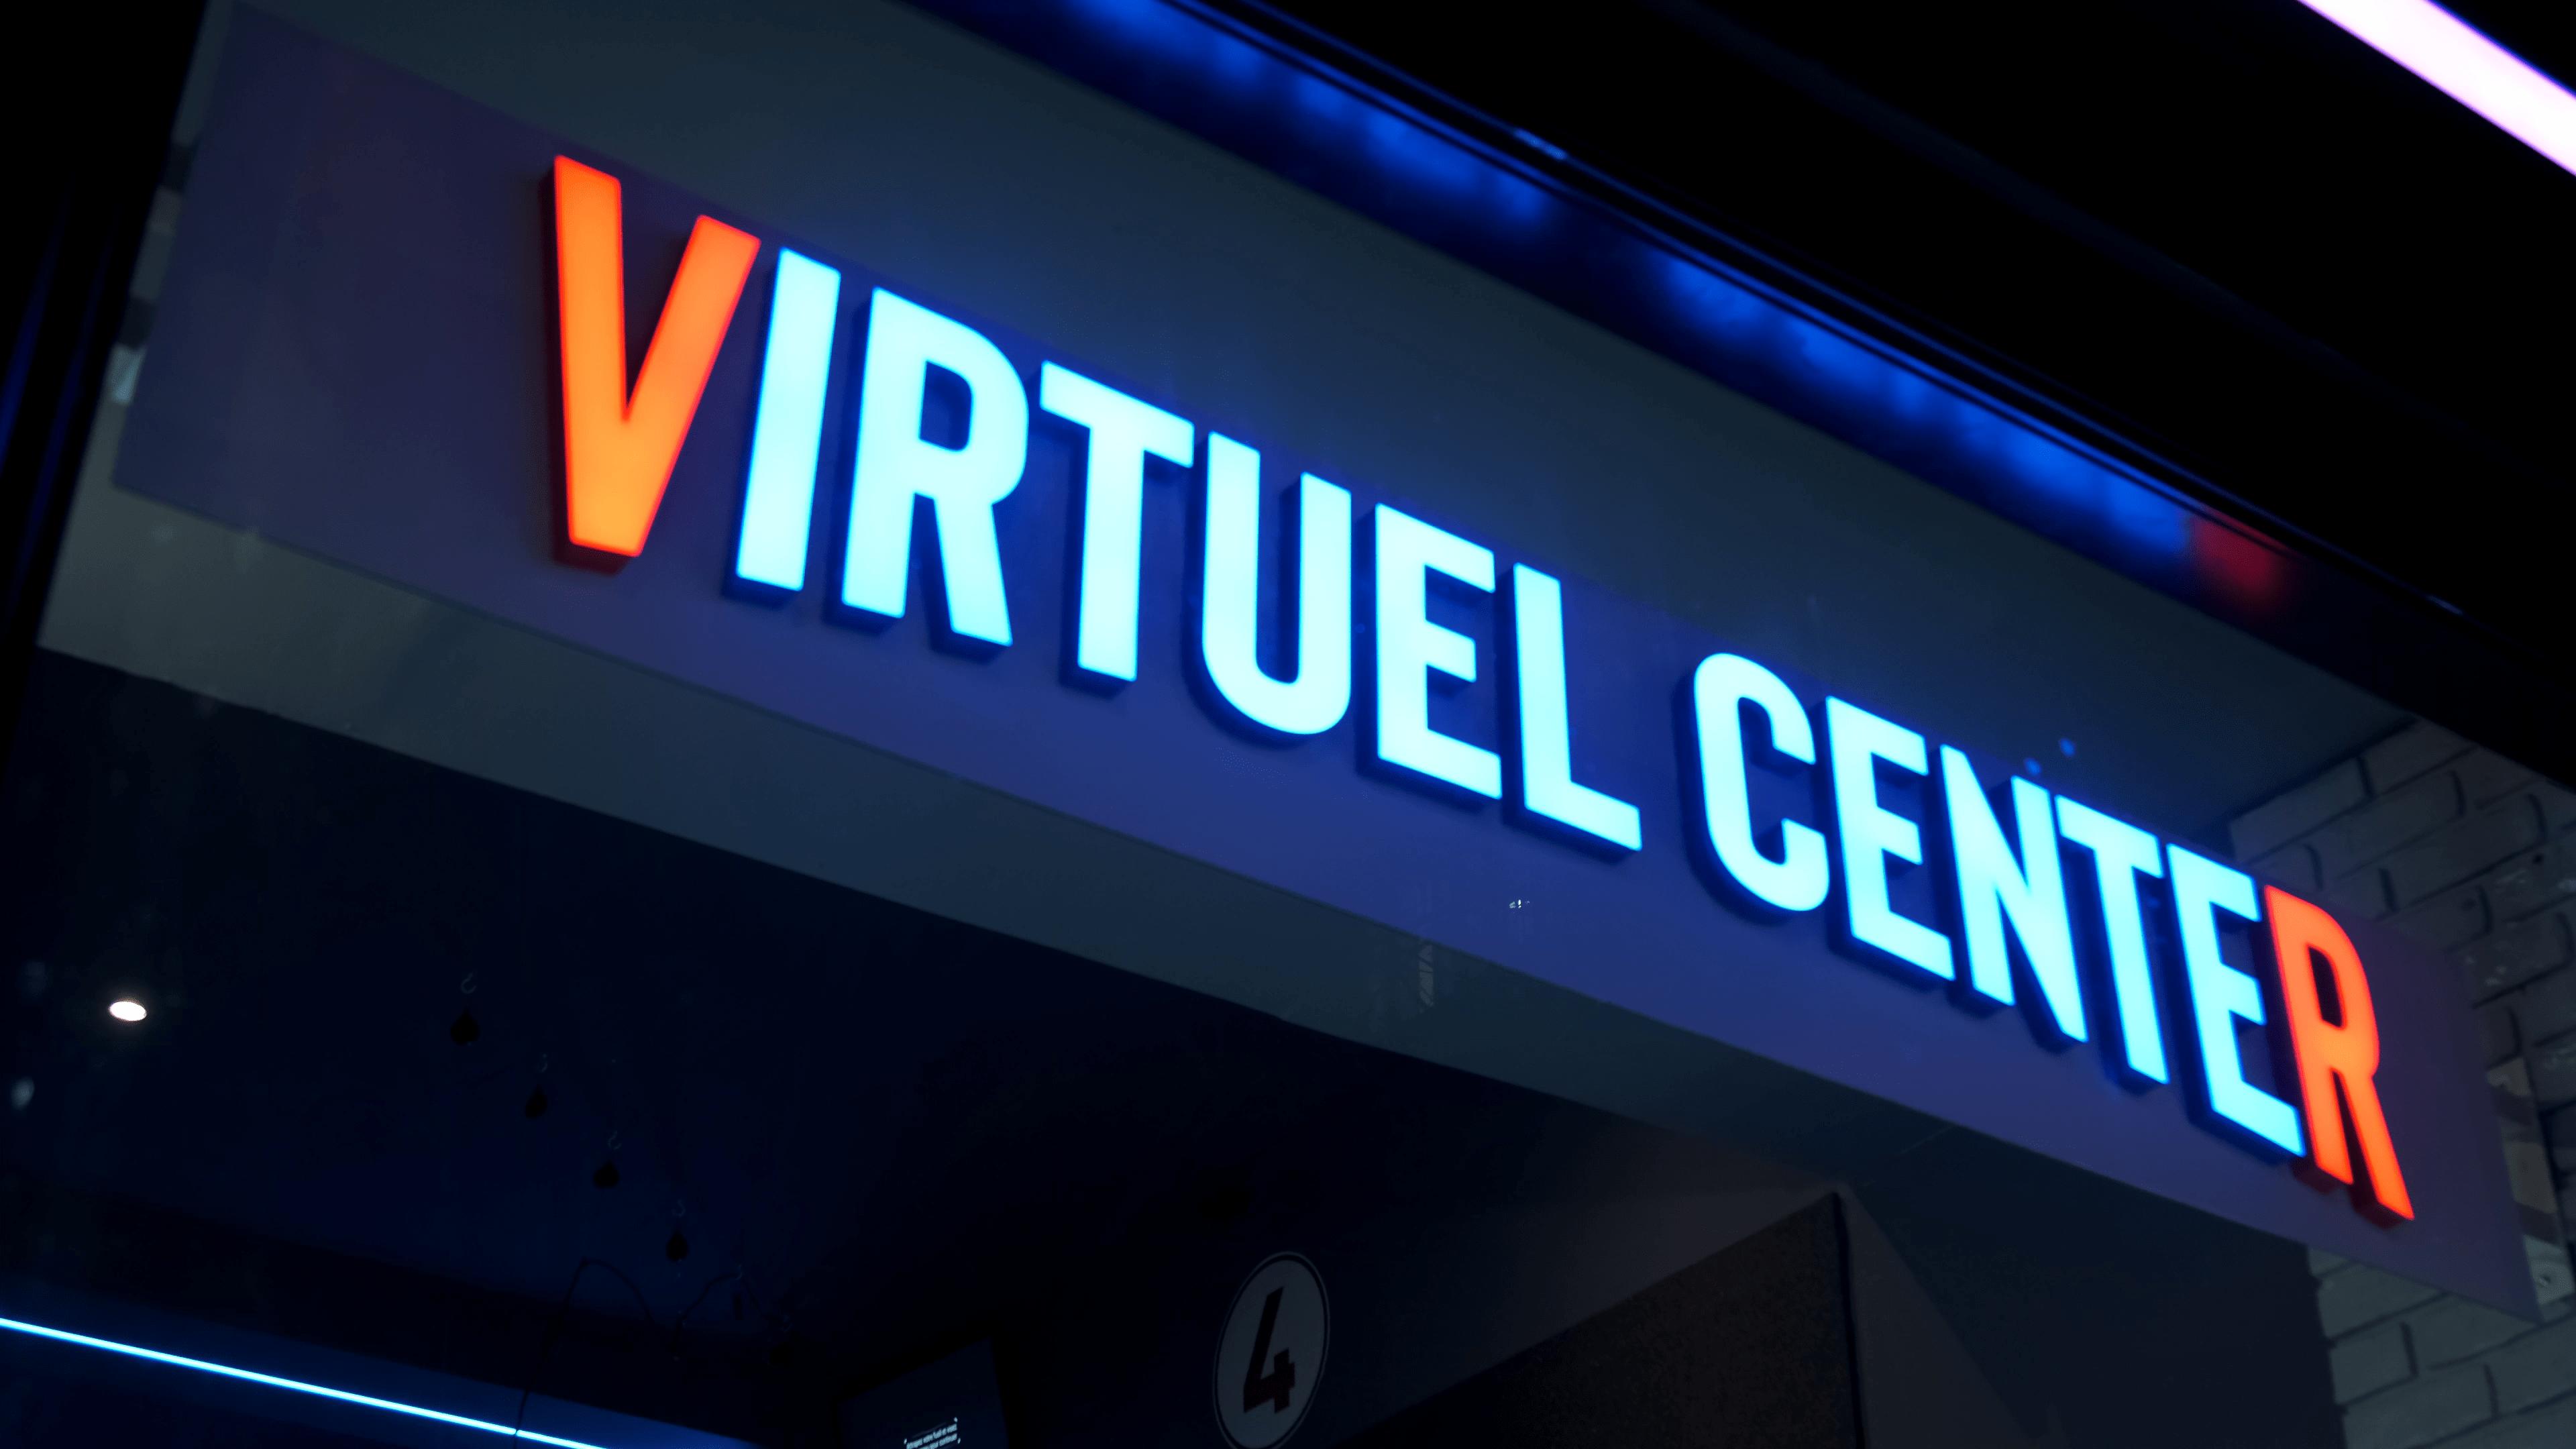 virtual center franchise